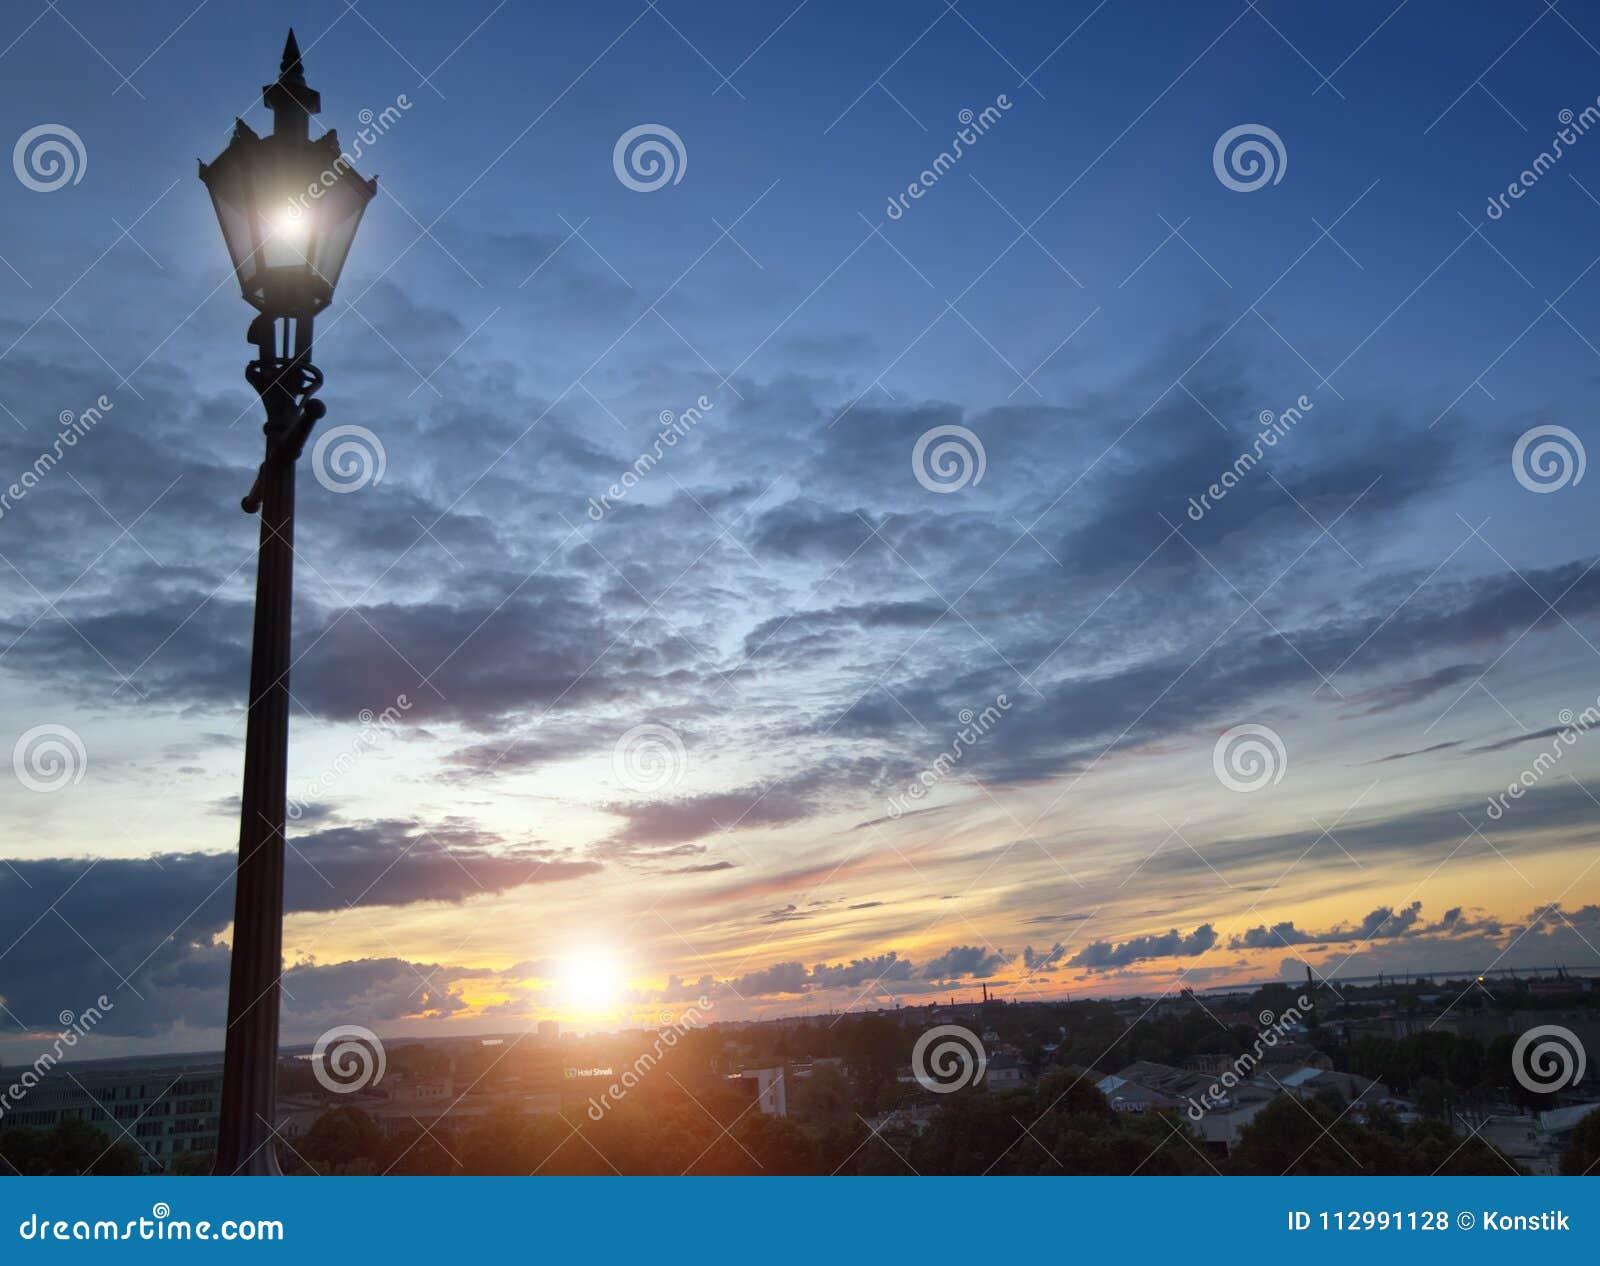 Lamp on an observation deck over the Old city. Tallinn, Estonia